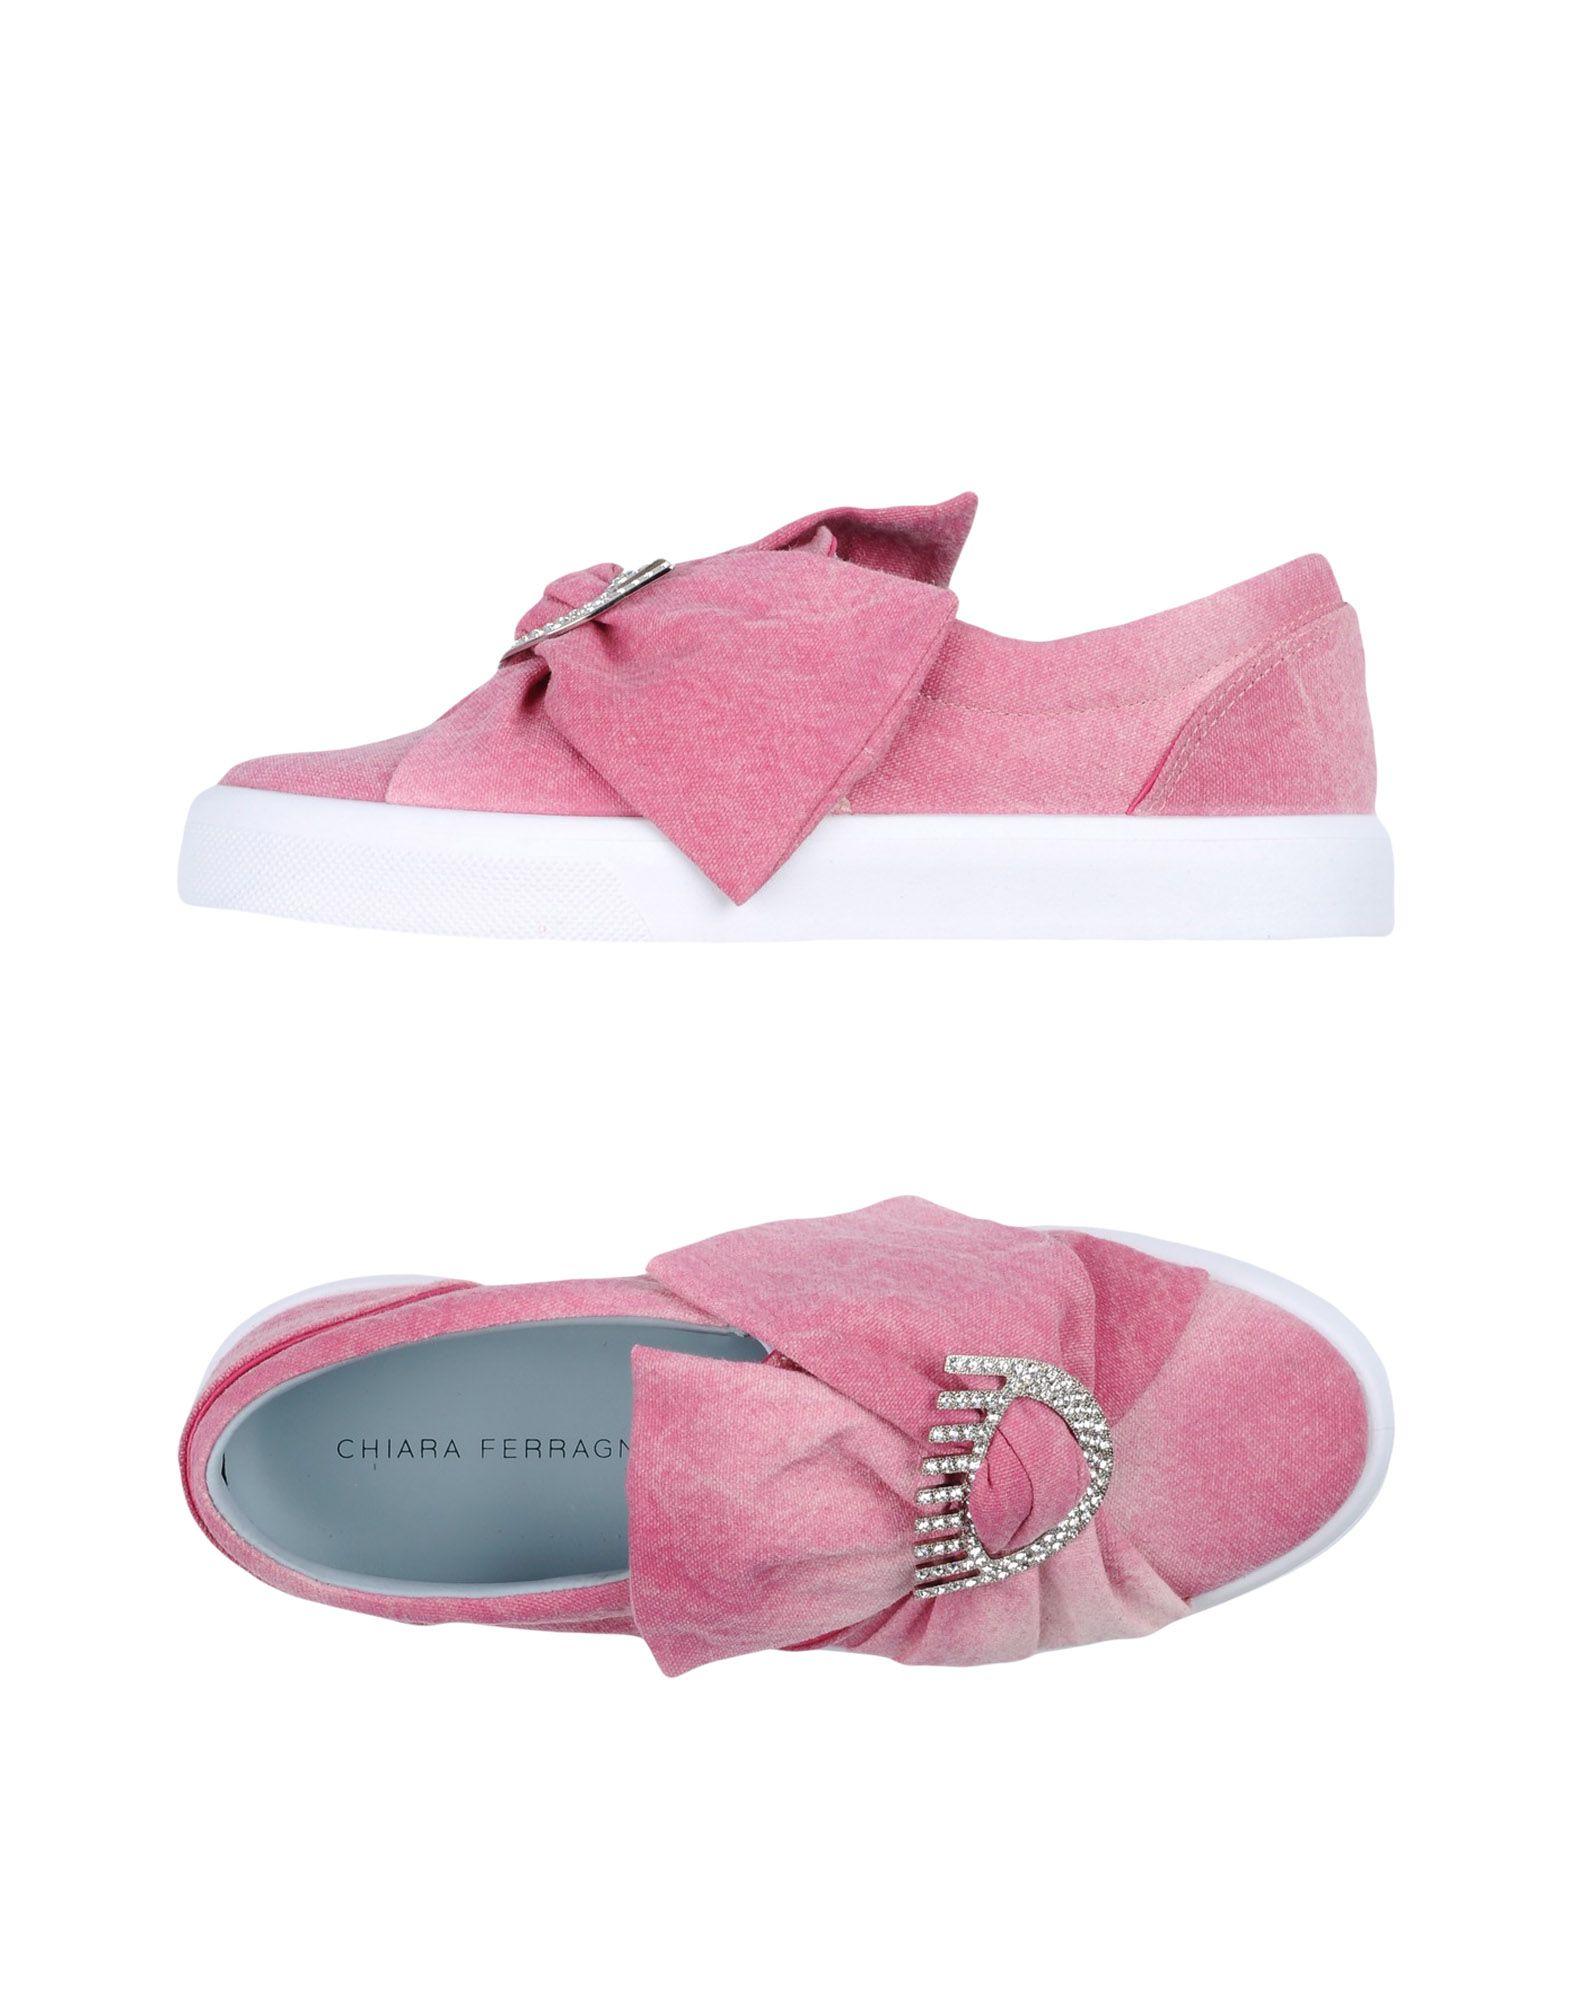 Chiara Ferragni Sneakers Damen  11339408JV Gute Qualität beliebte Schuhe